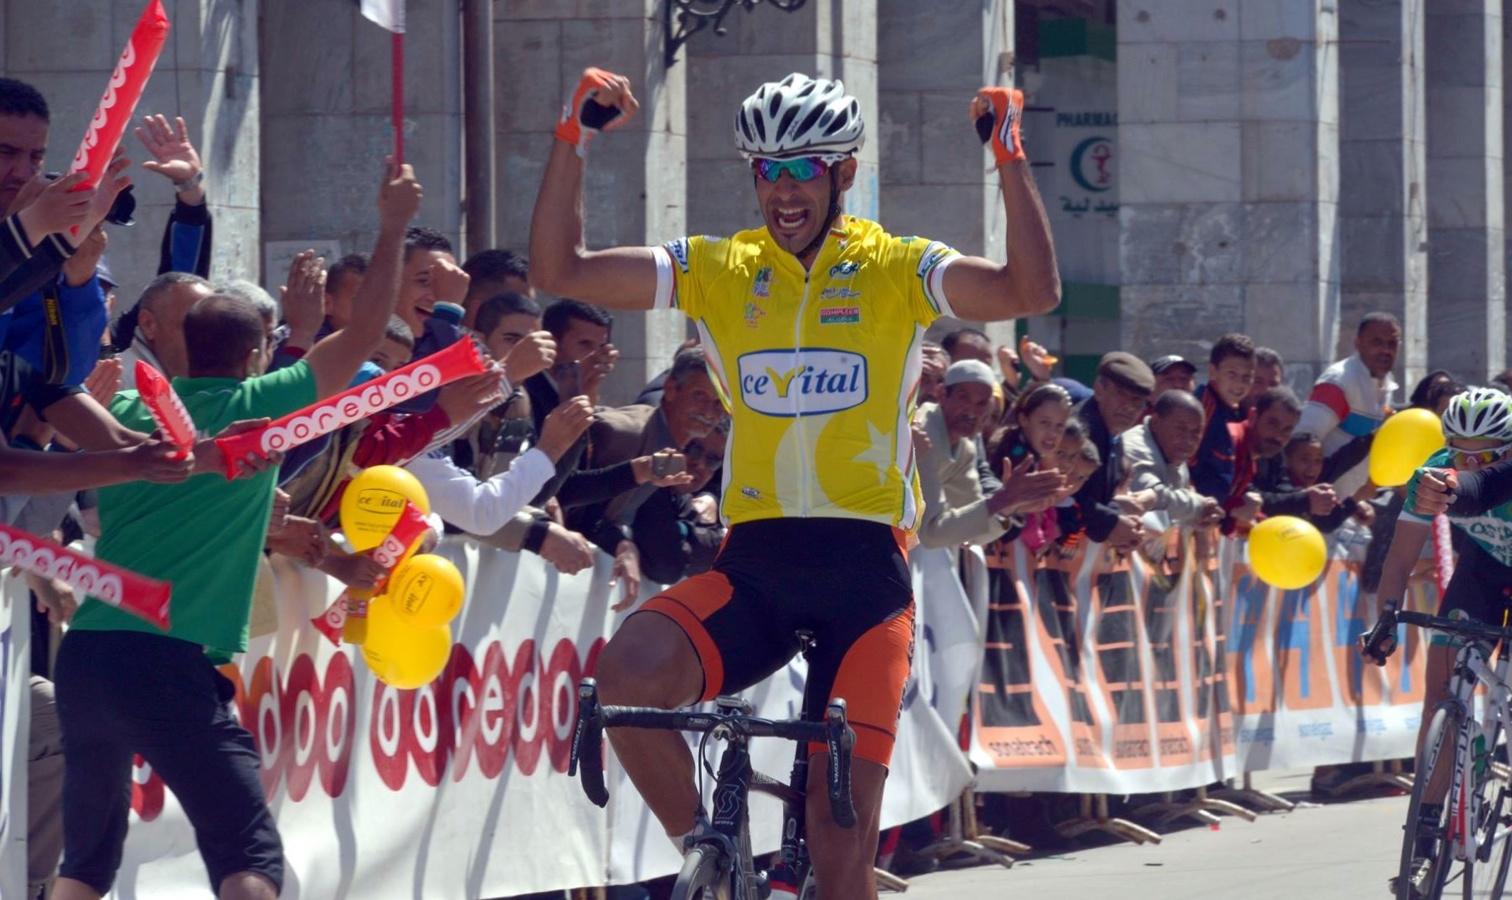 cyclisme_tourd'algerie_maillot jaune